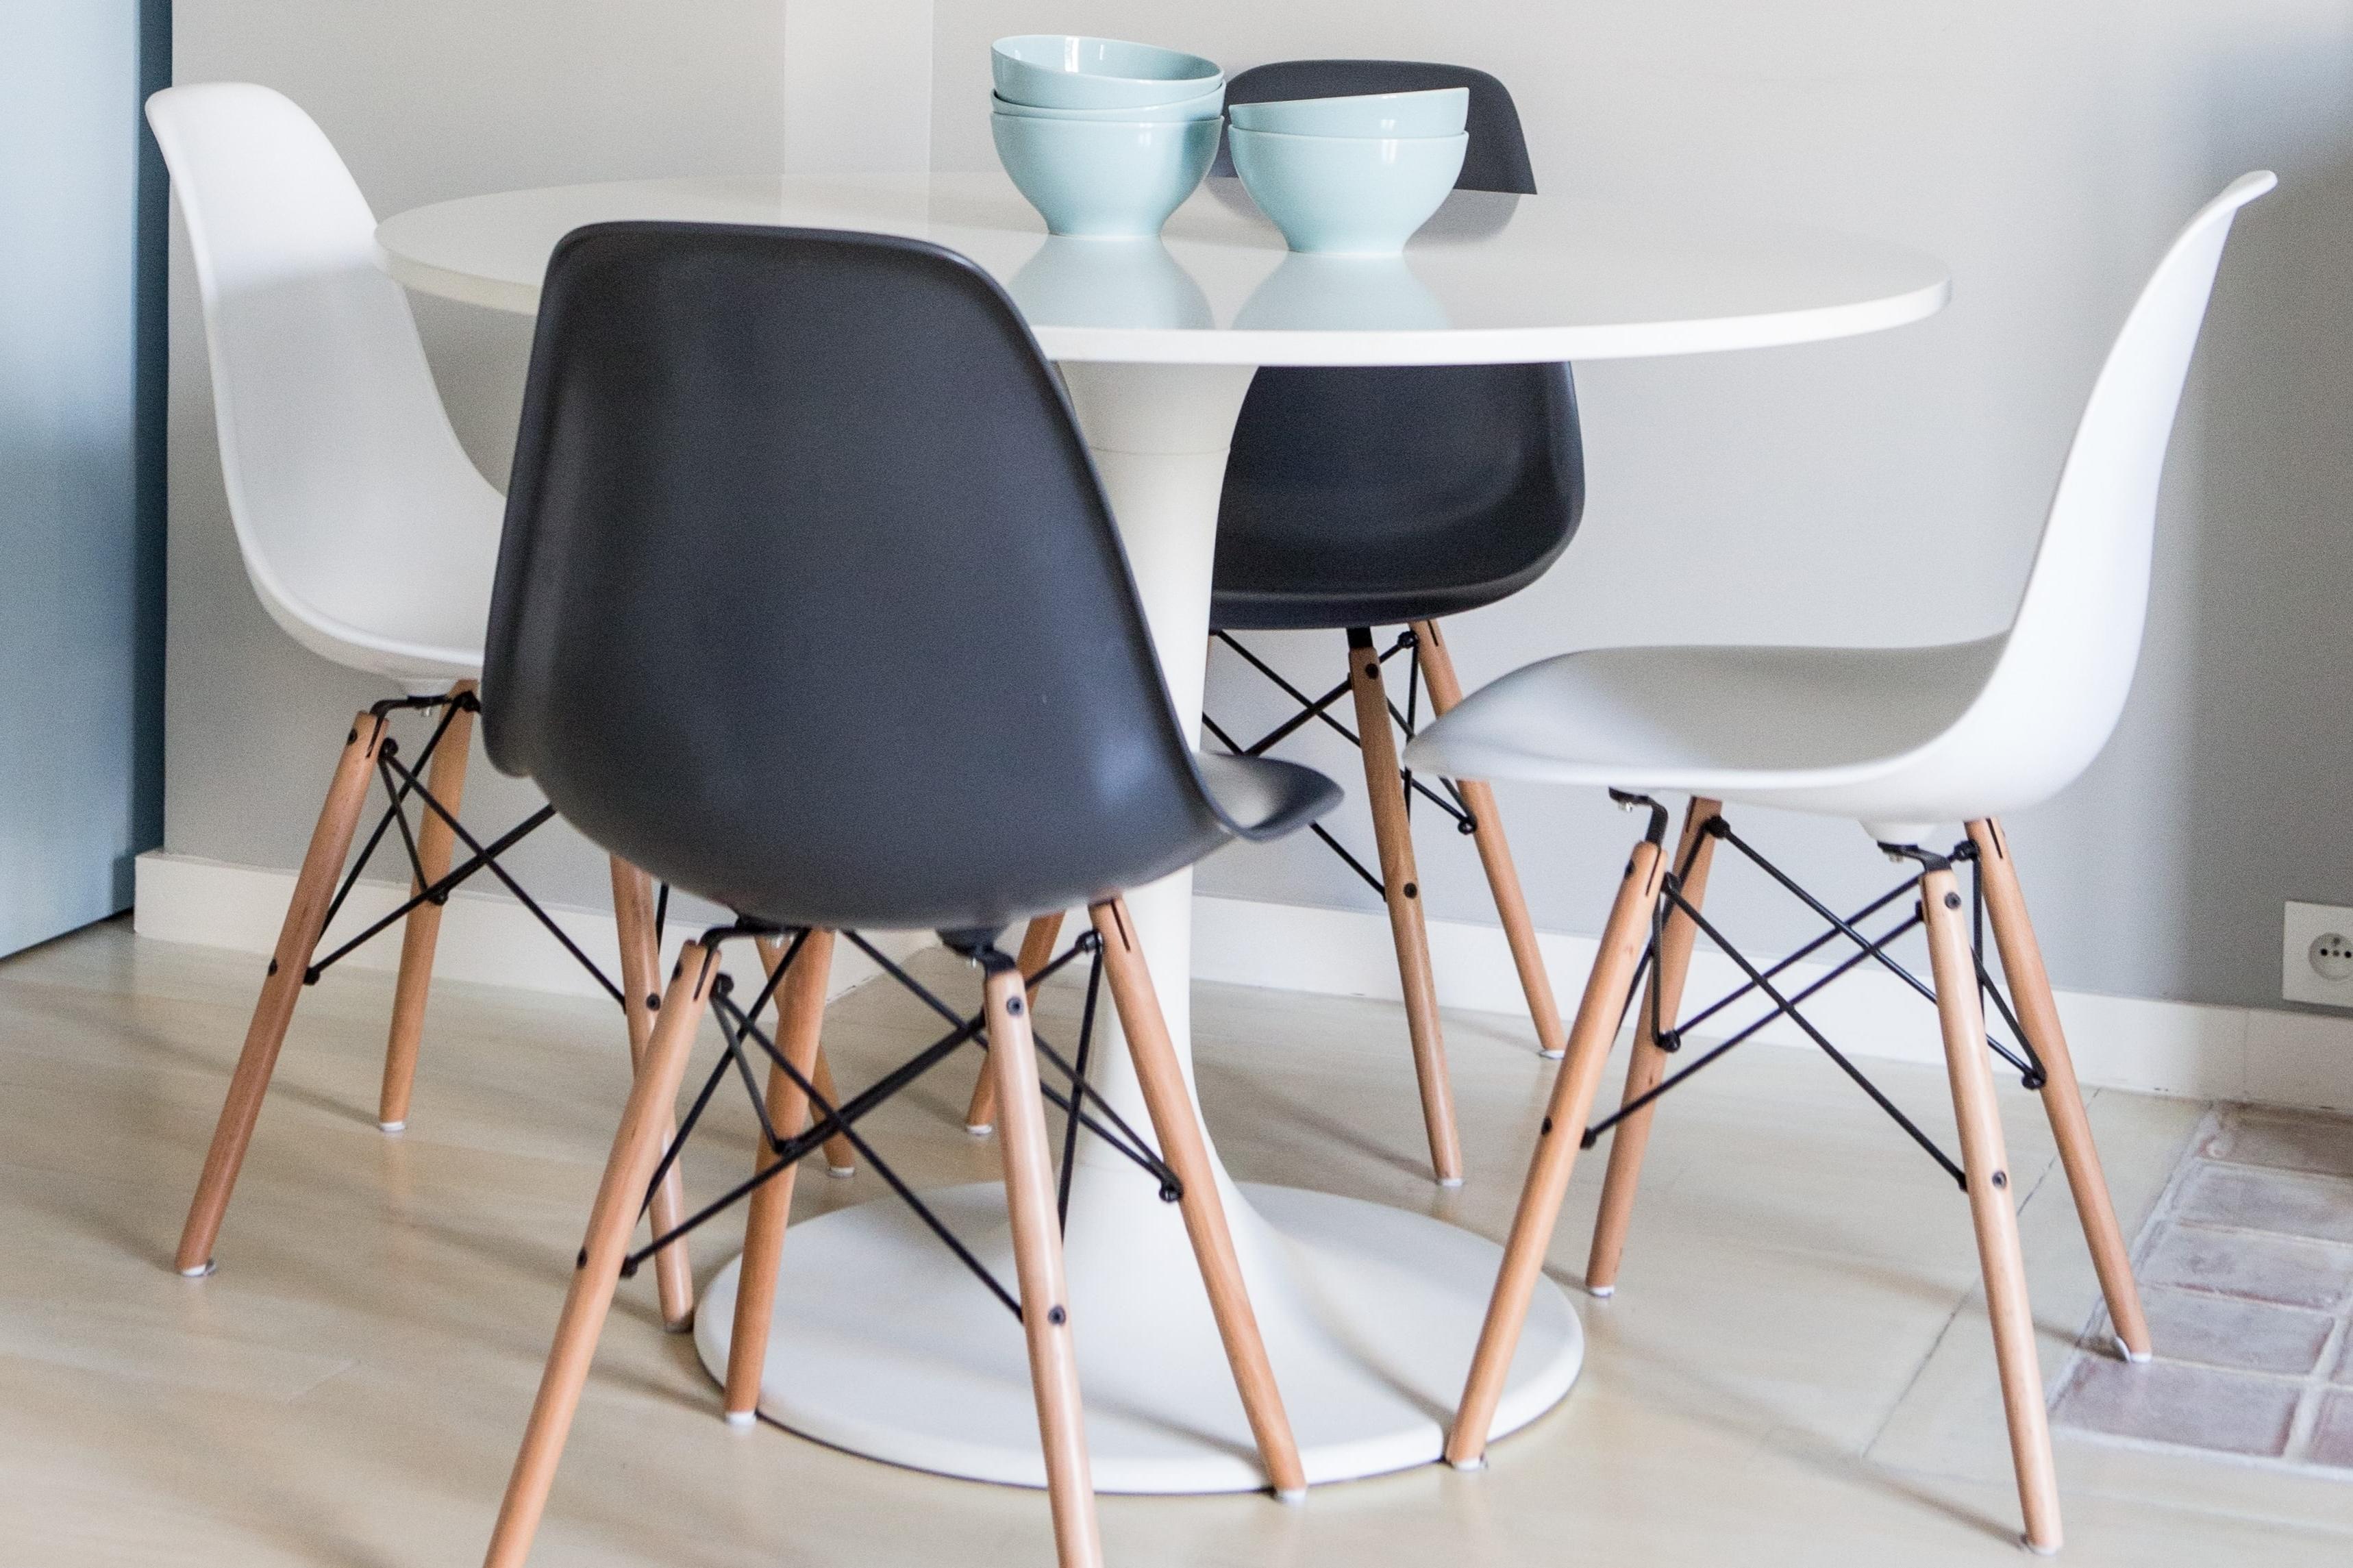 Preferred Chaises Eames Pas Cher ~ Meilleures Images D'inspiration Pour In Eames La Chaises (View 15 of 15)